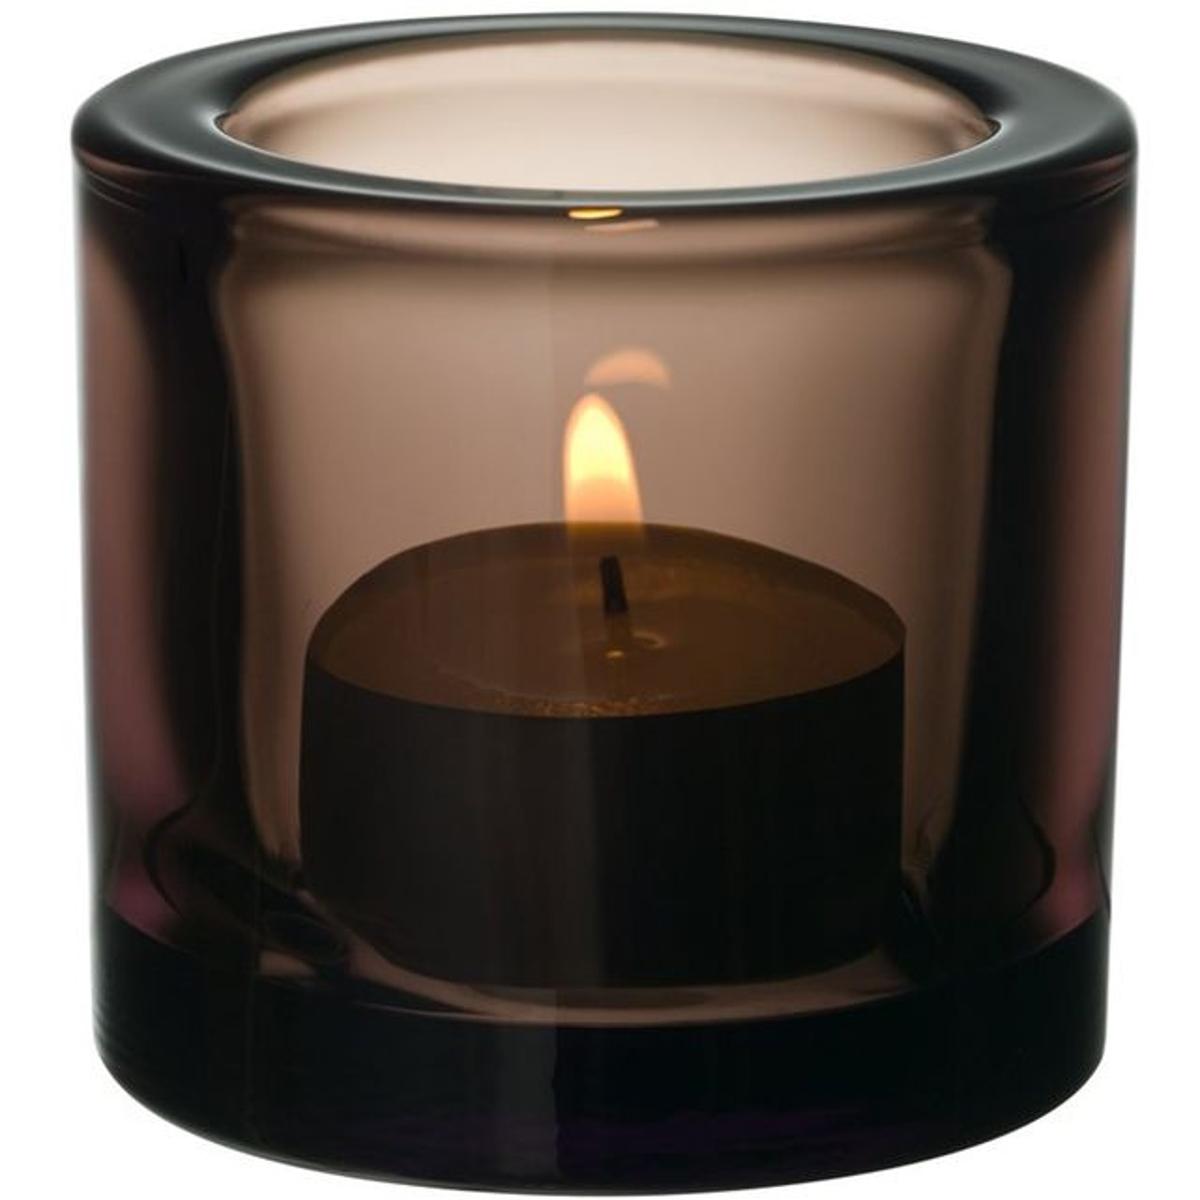 Support à bougie chauffe-plat iittala Kivi- Sable